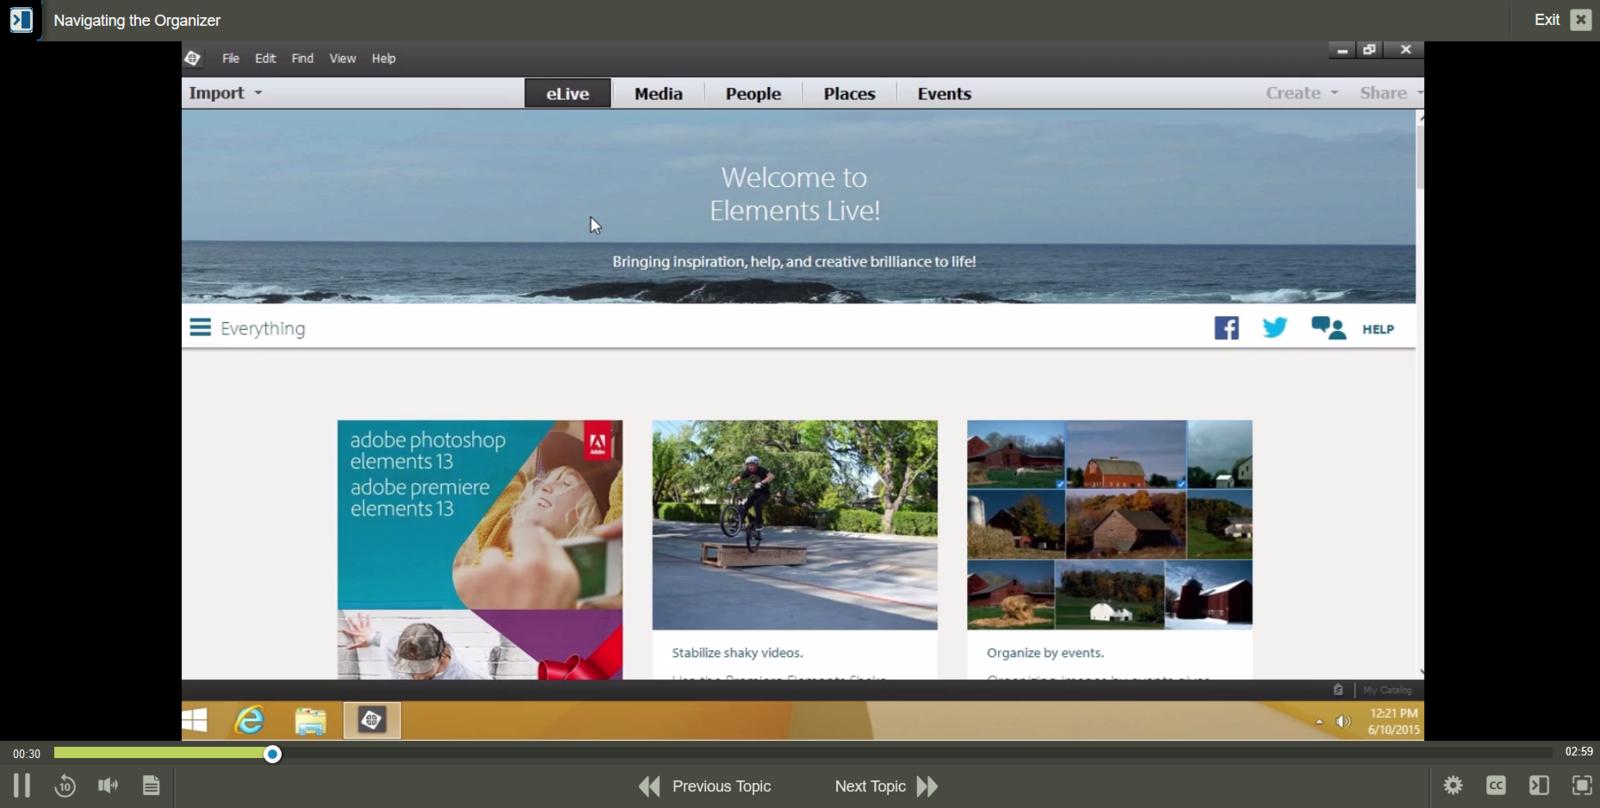 Adobe Adobe Premiere Elements 13 E-Learning Kurs